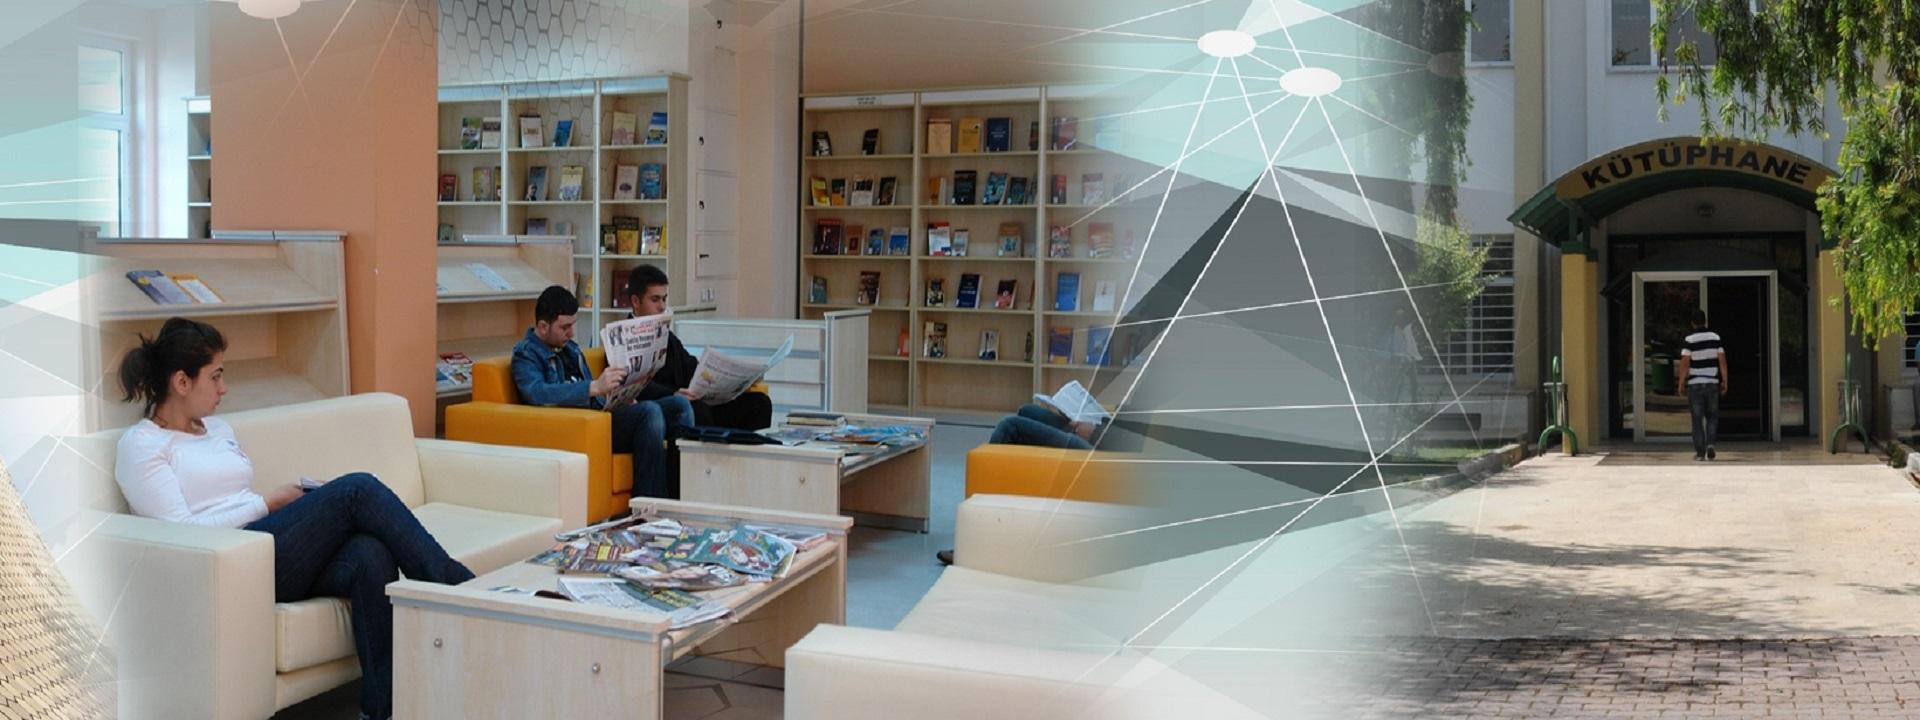 Kütüphane Ana Sayfa